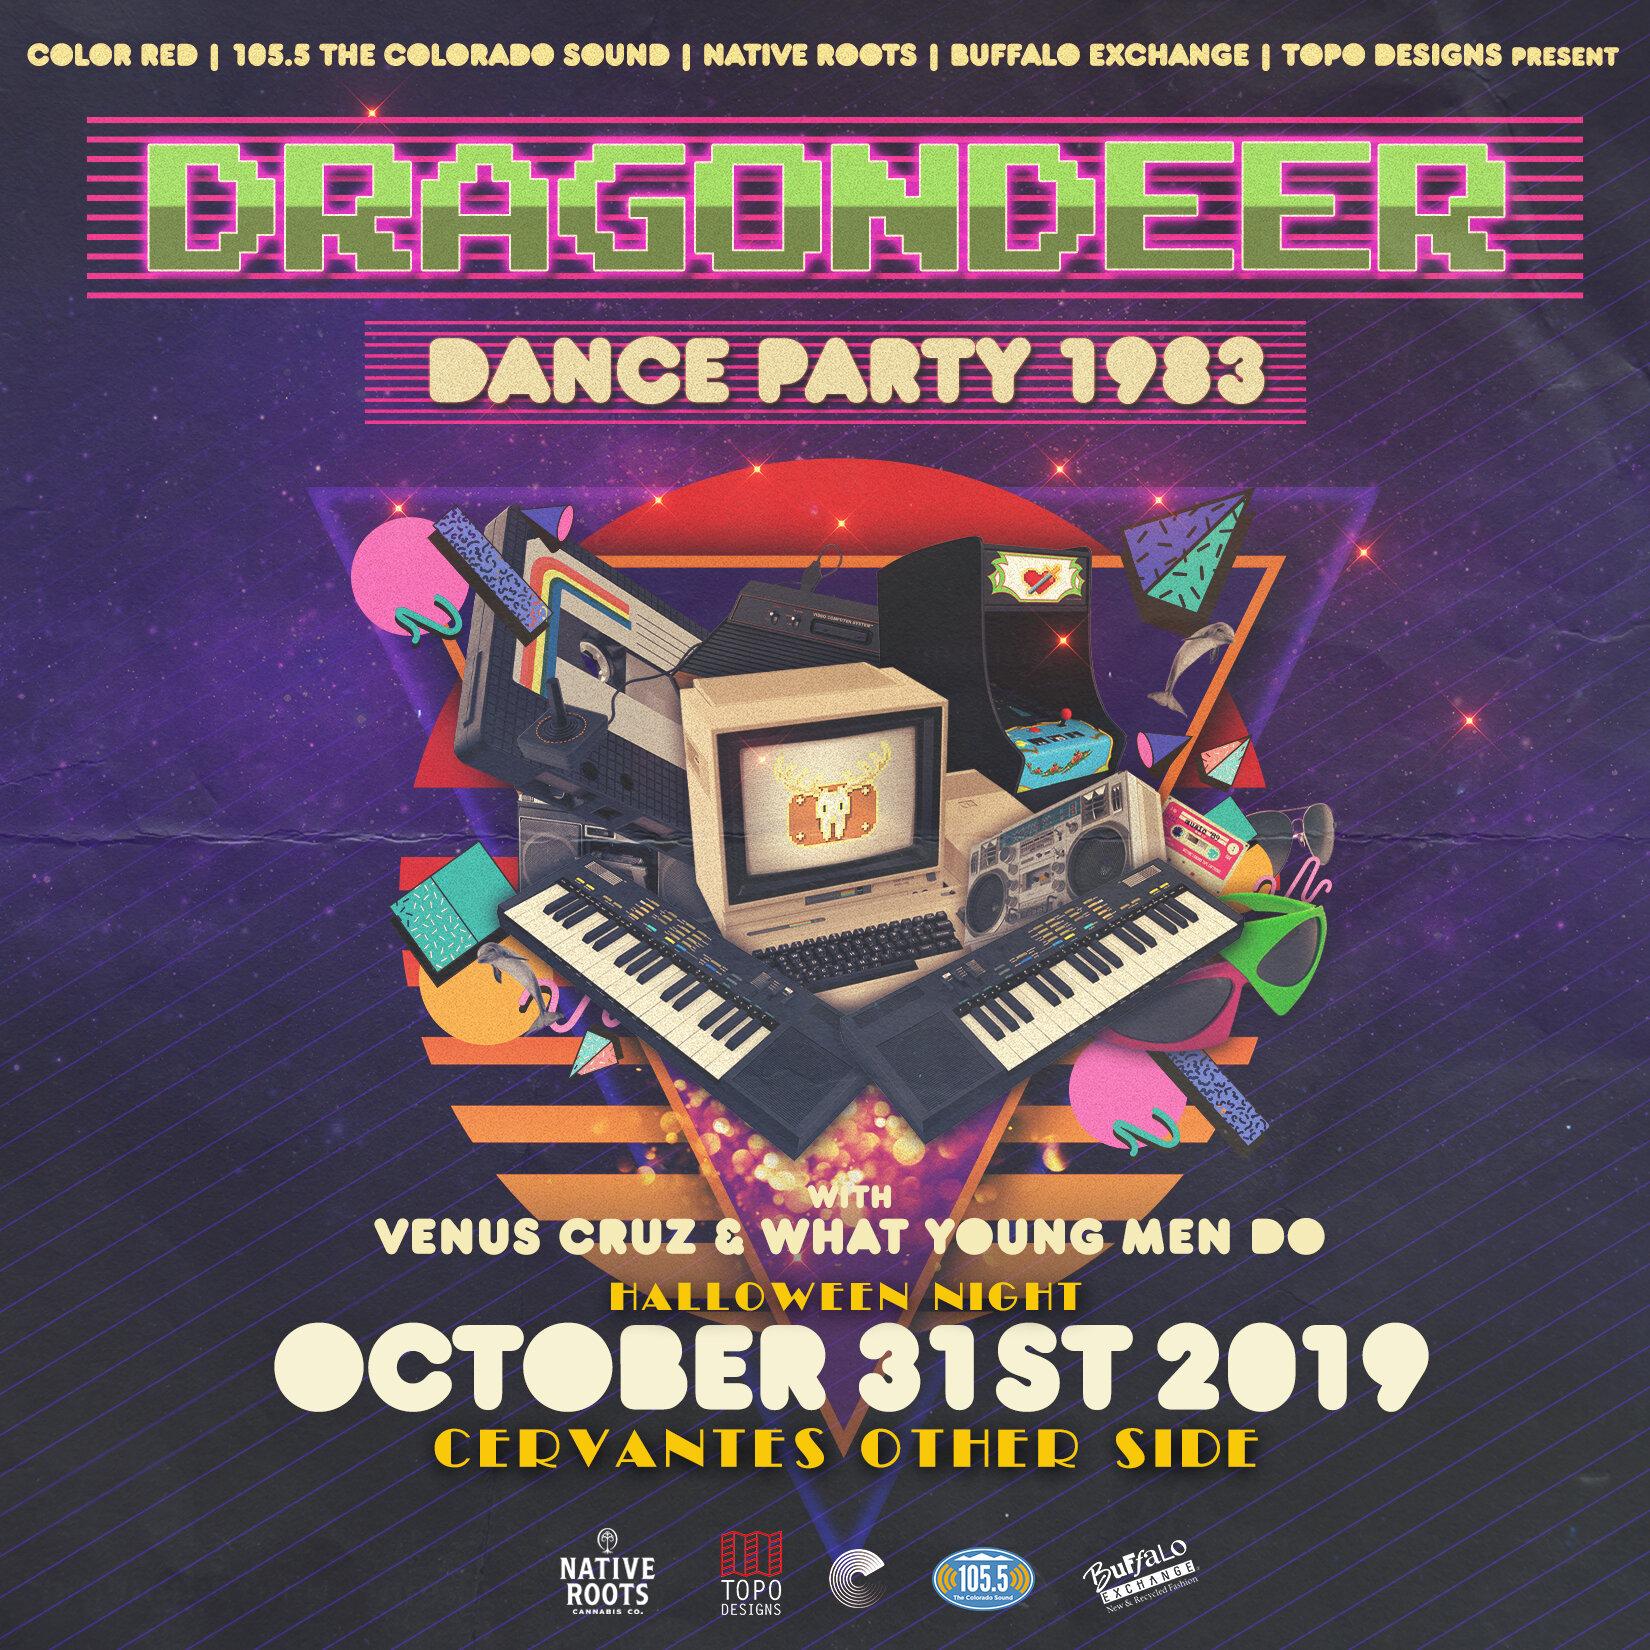 2019-10-31 - Dragondeer Halloween IG.jpg